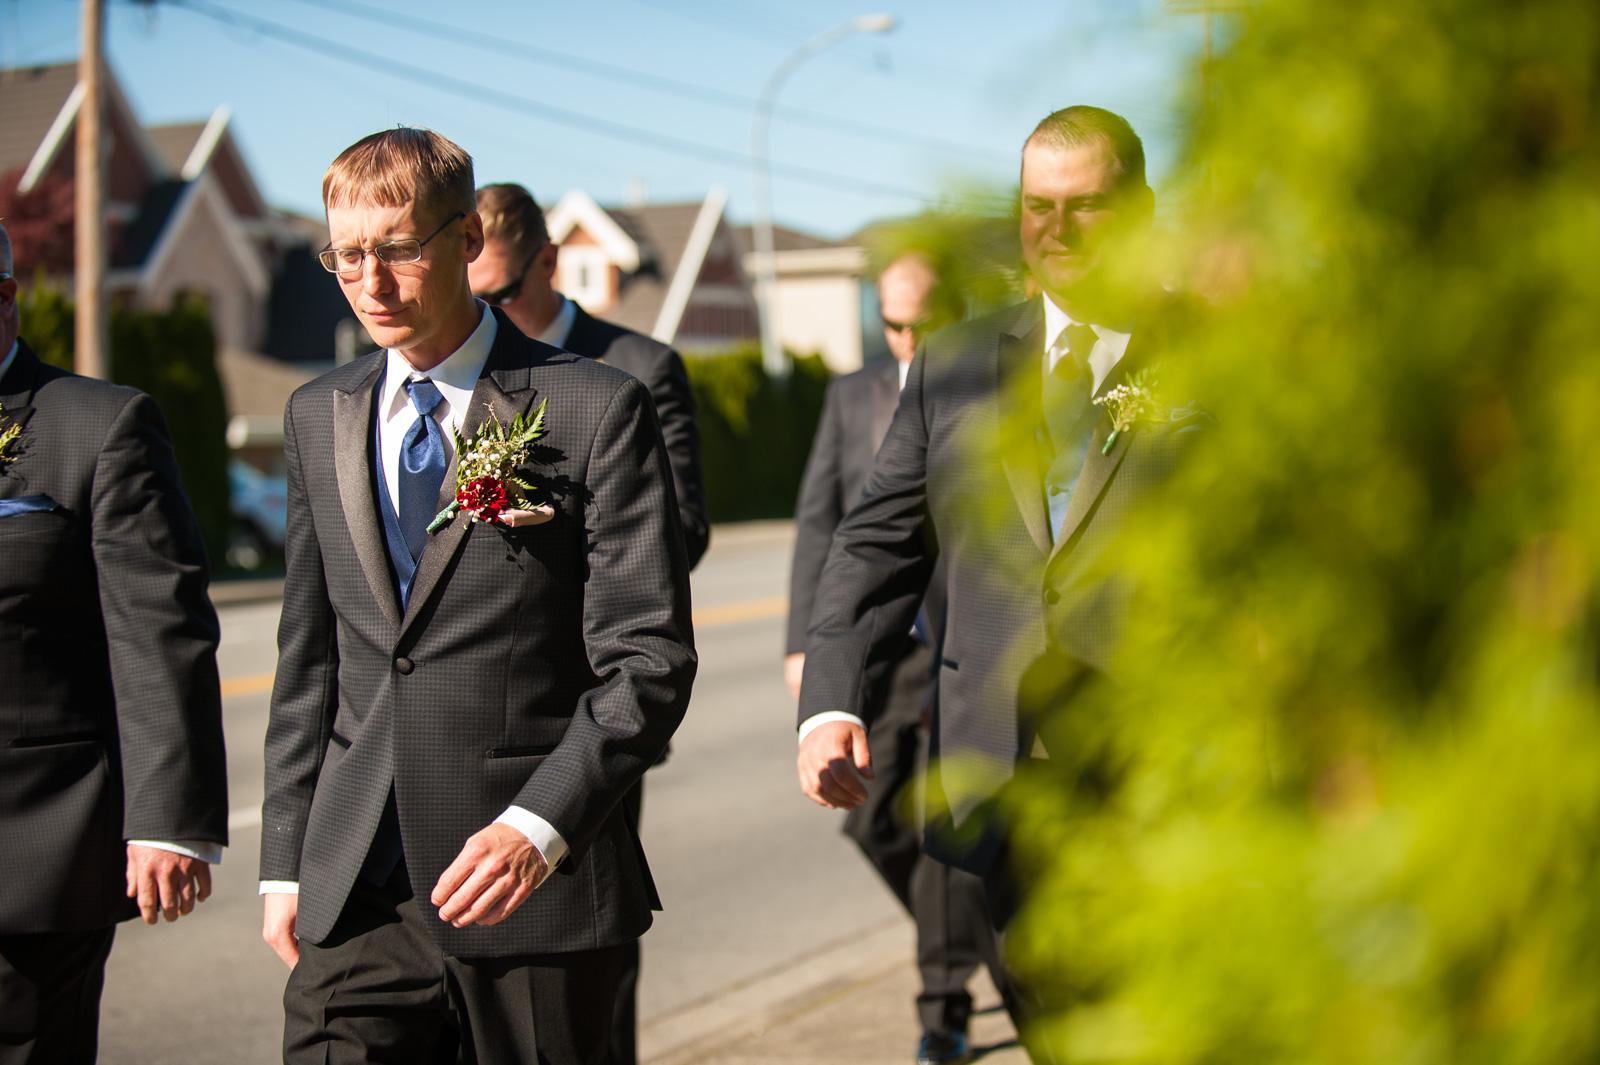 bc-wedding-photographers-paradise-banquet-hall-wedding-13.jpg